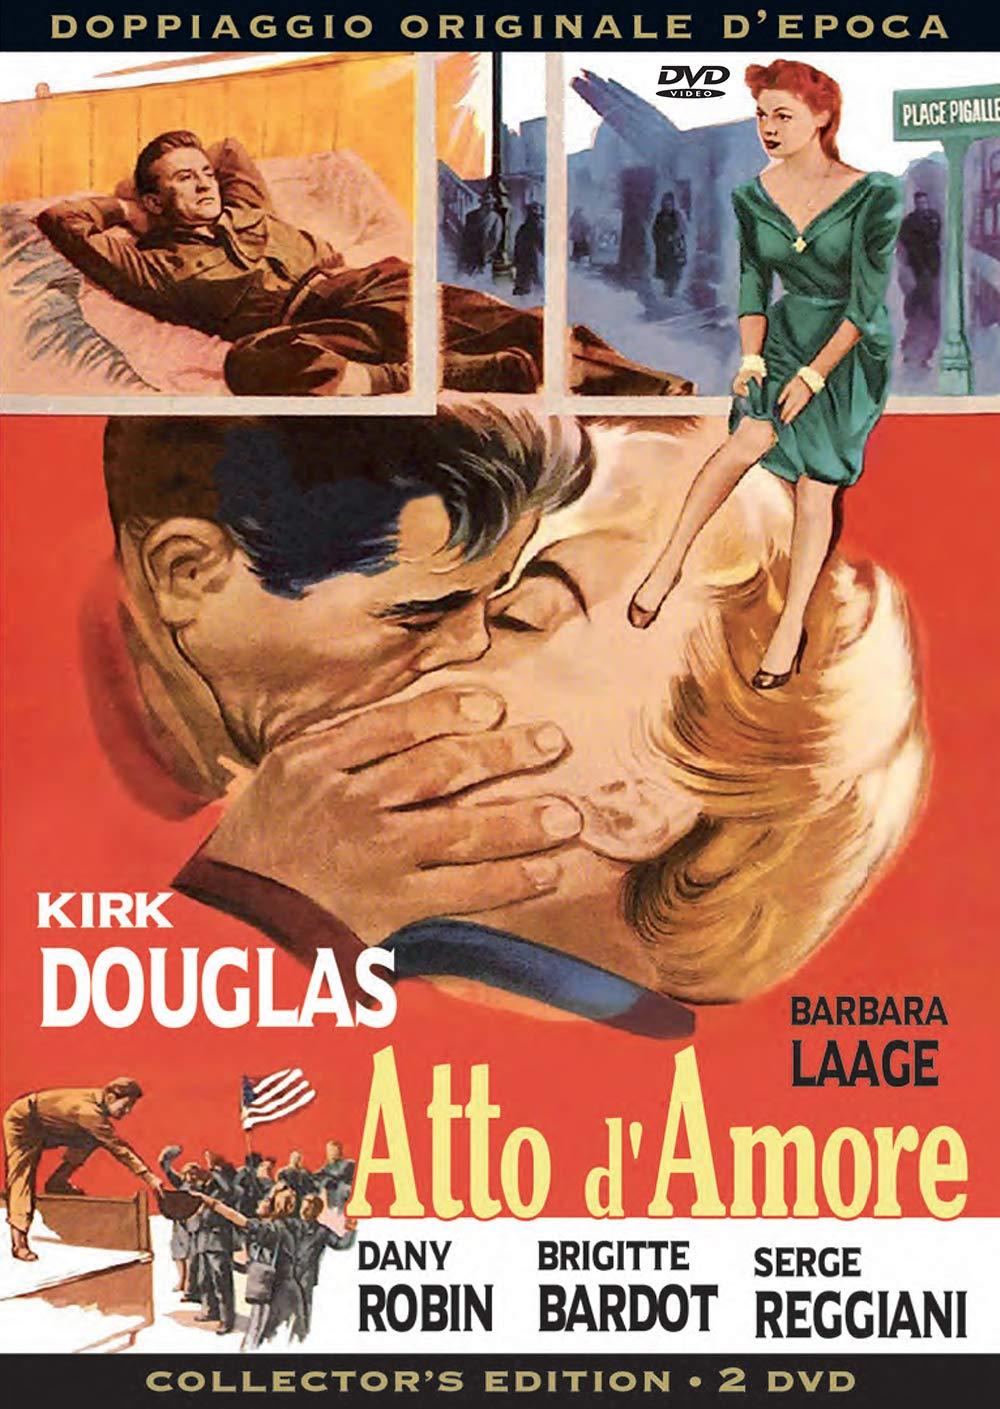 ATTO D'AMORE (2 DVD) (DVD)